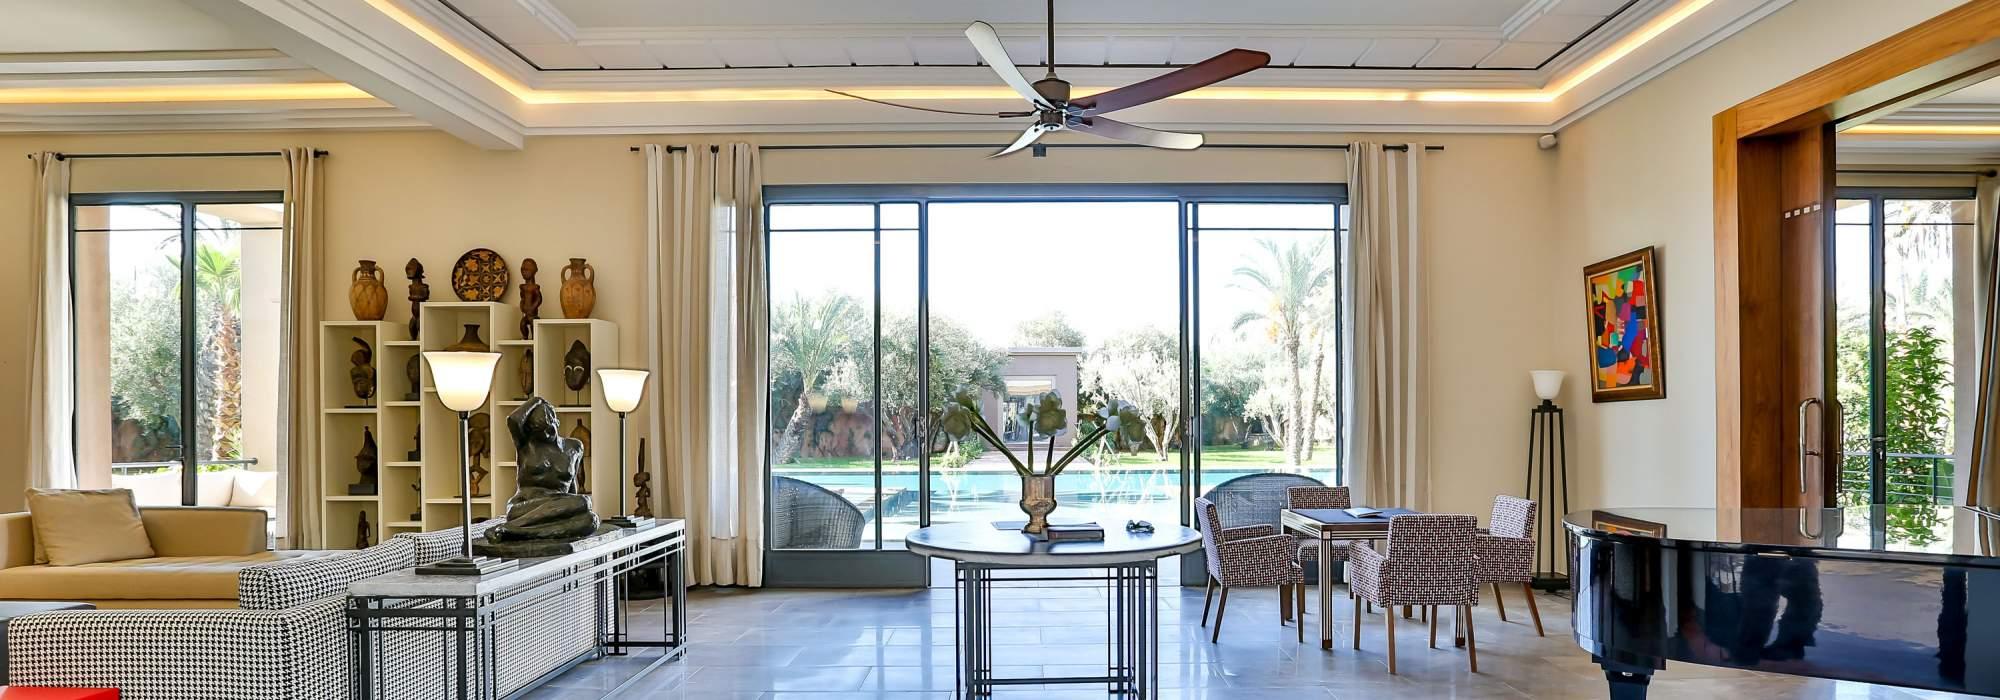 achat villa luxe amelkis marrakech